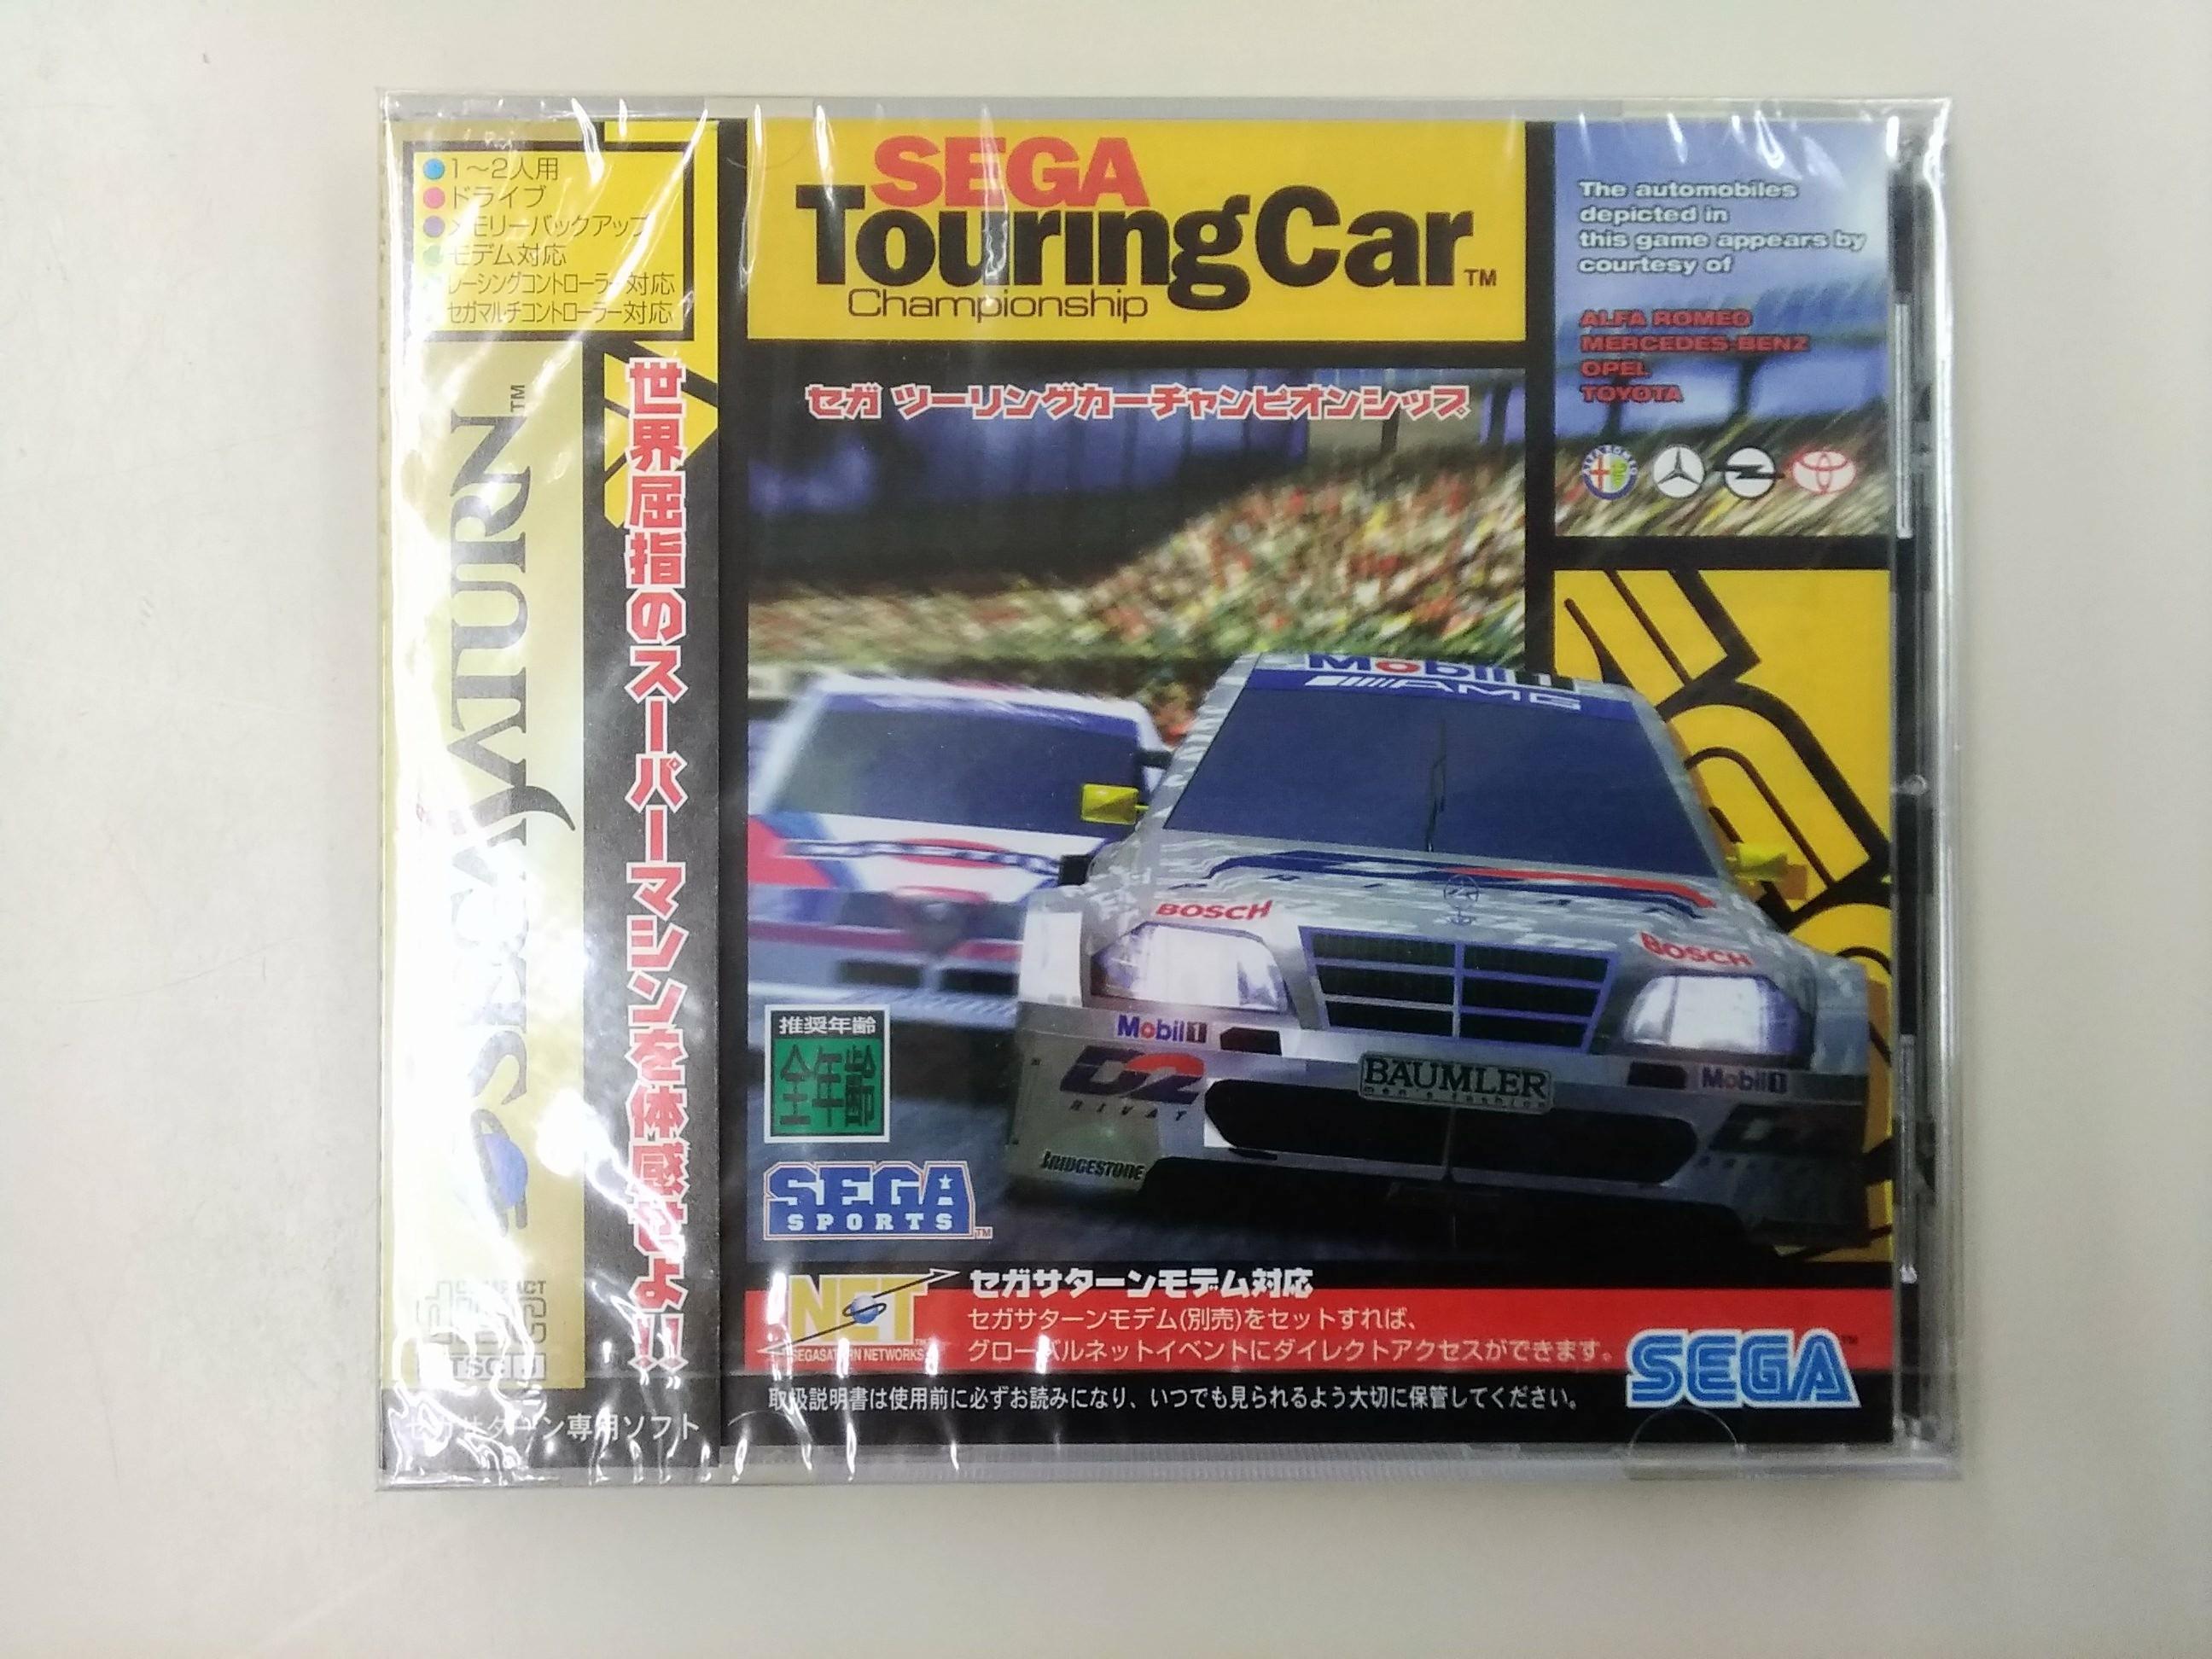 SEGA Touring Car|SEGA